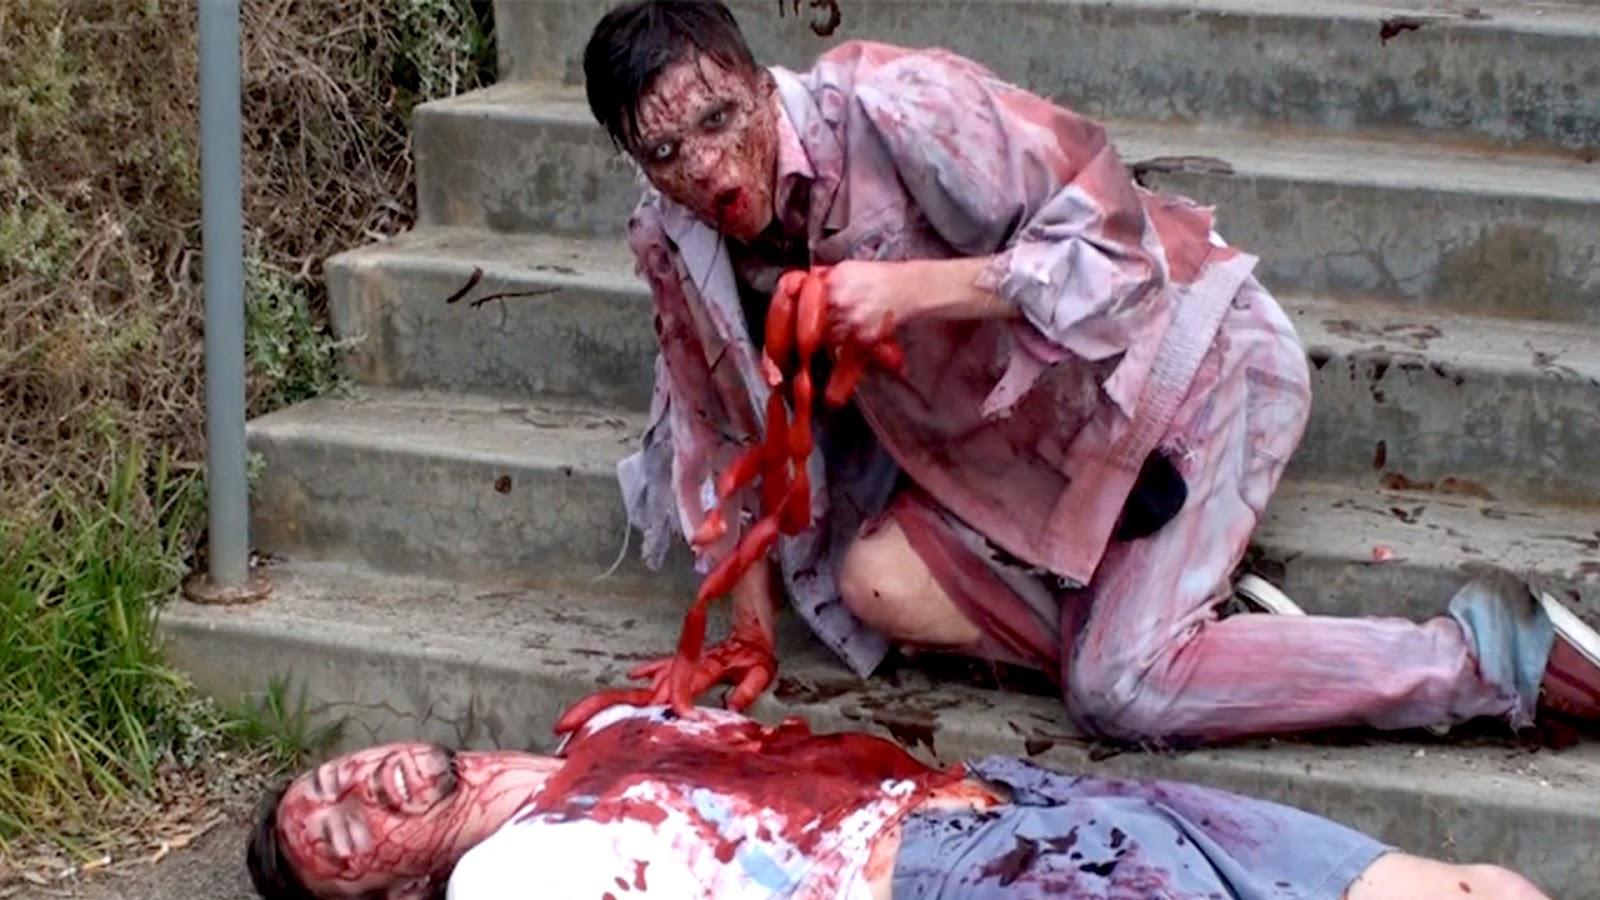 funny zombie prank videos - Funny Halloween Prank